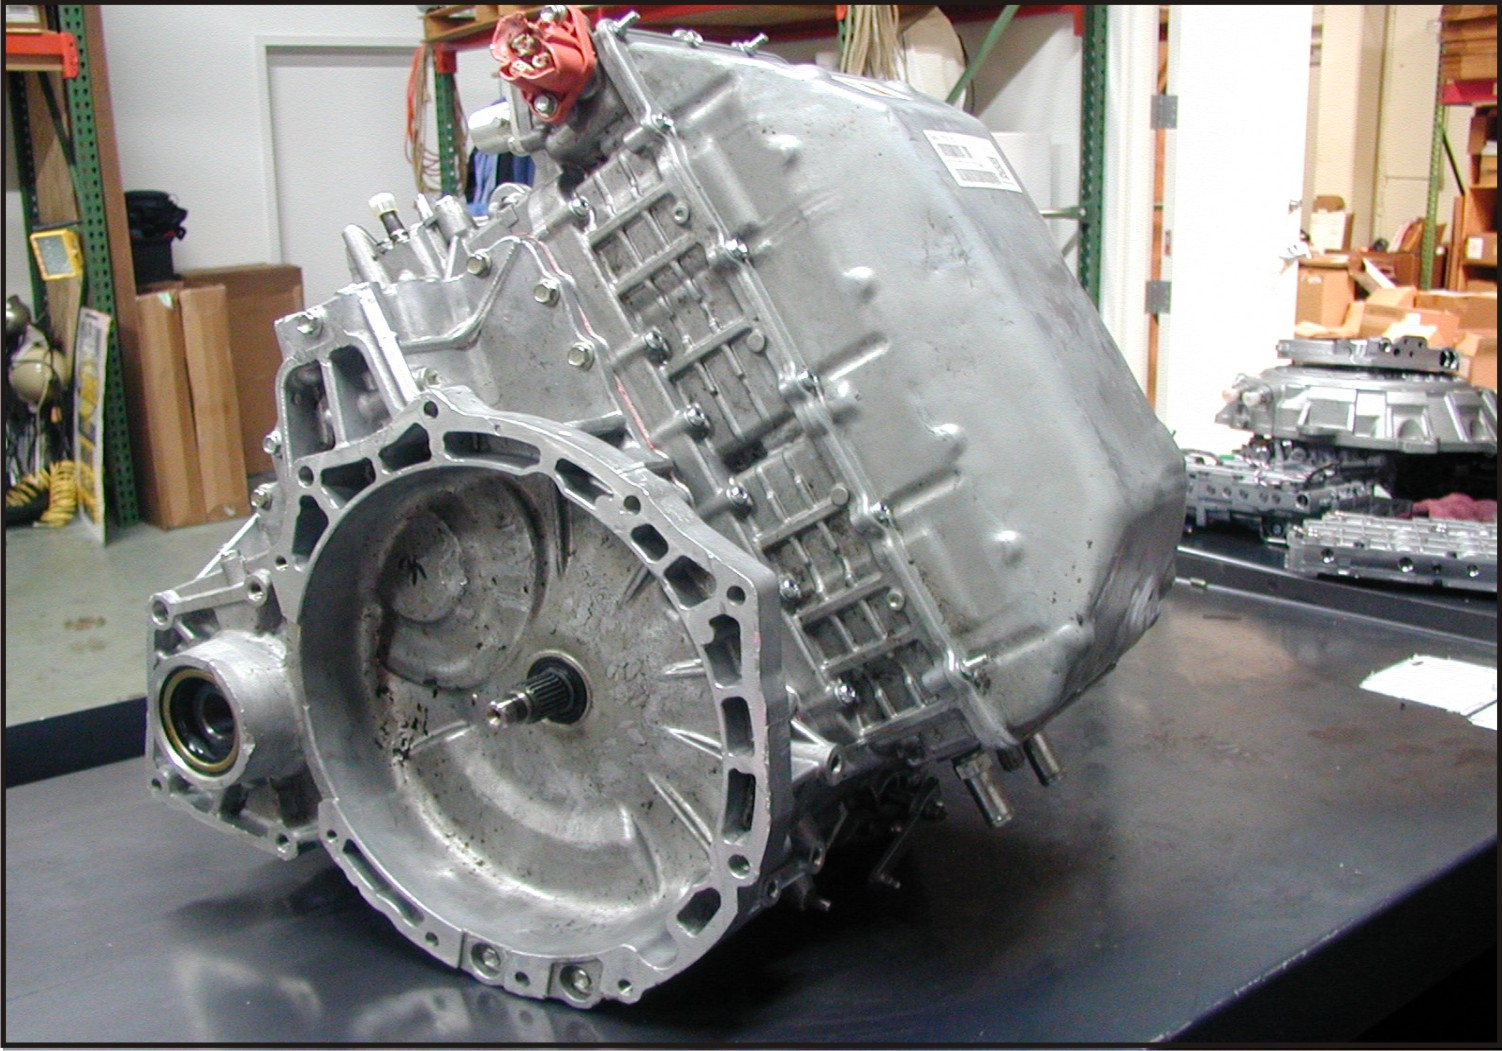 ATSG Ford Escape Hybrid Preliminary Information - Figure 17